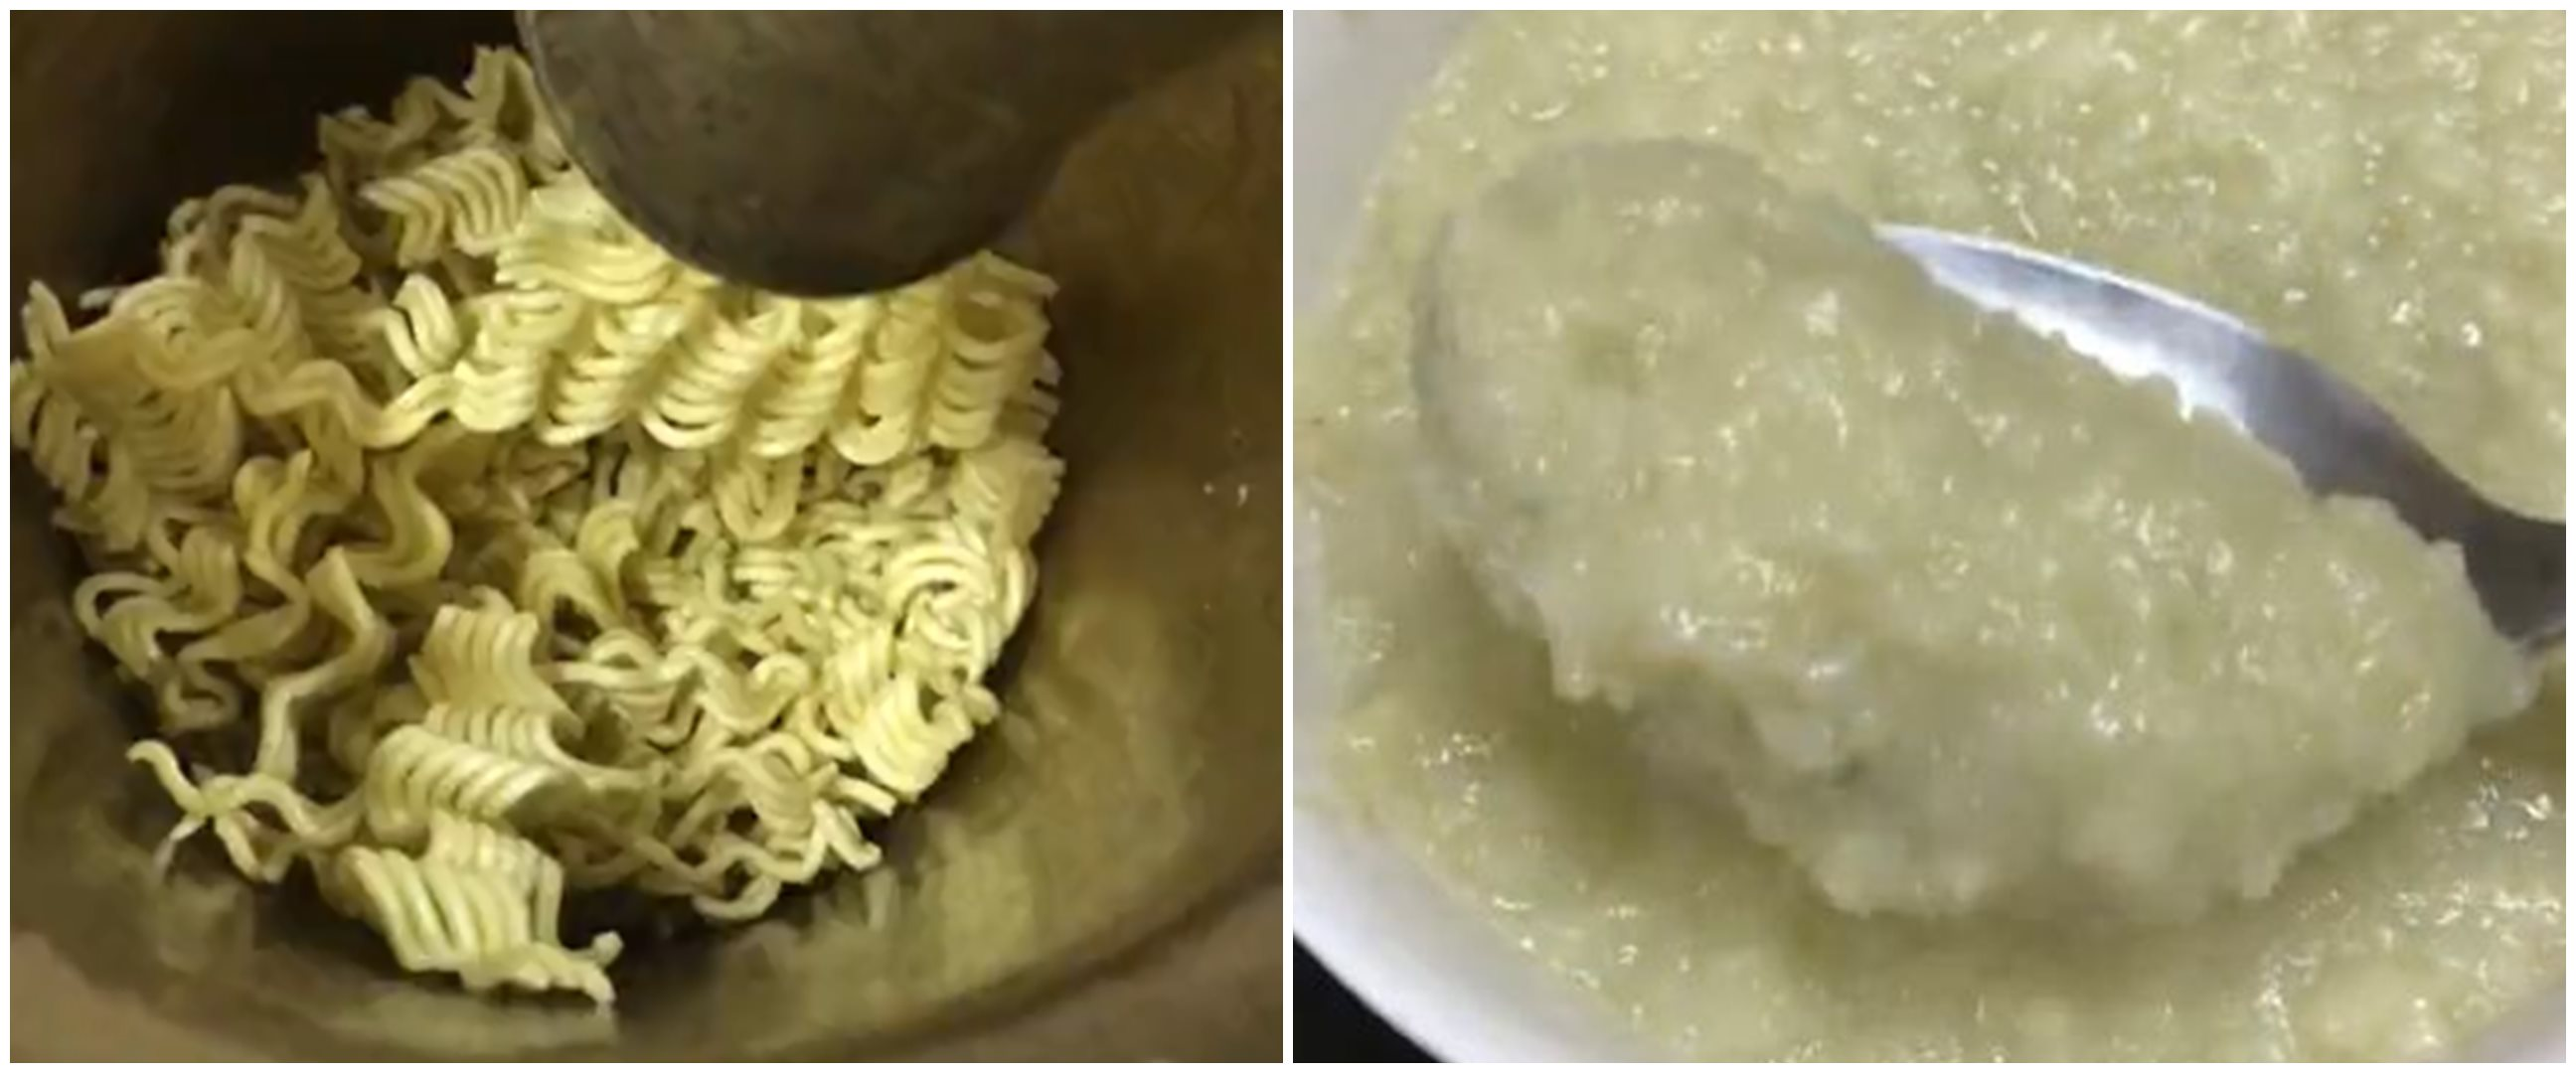 Viral orang masak mi instan jadi bubur, warganet sebut 'aliran' baru